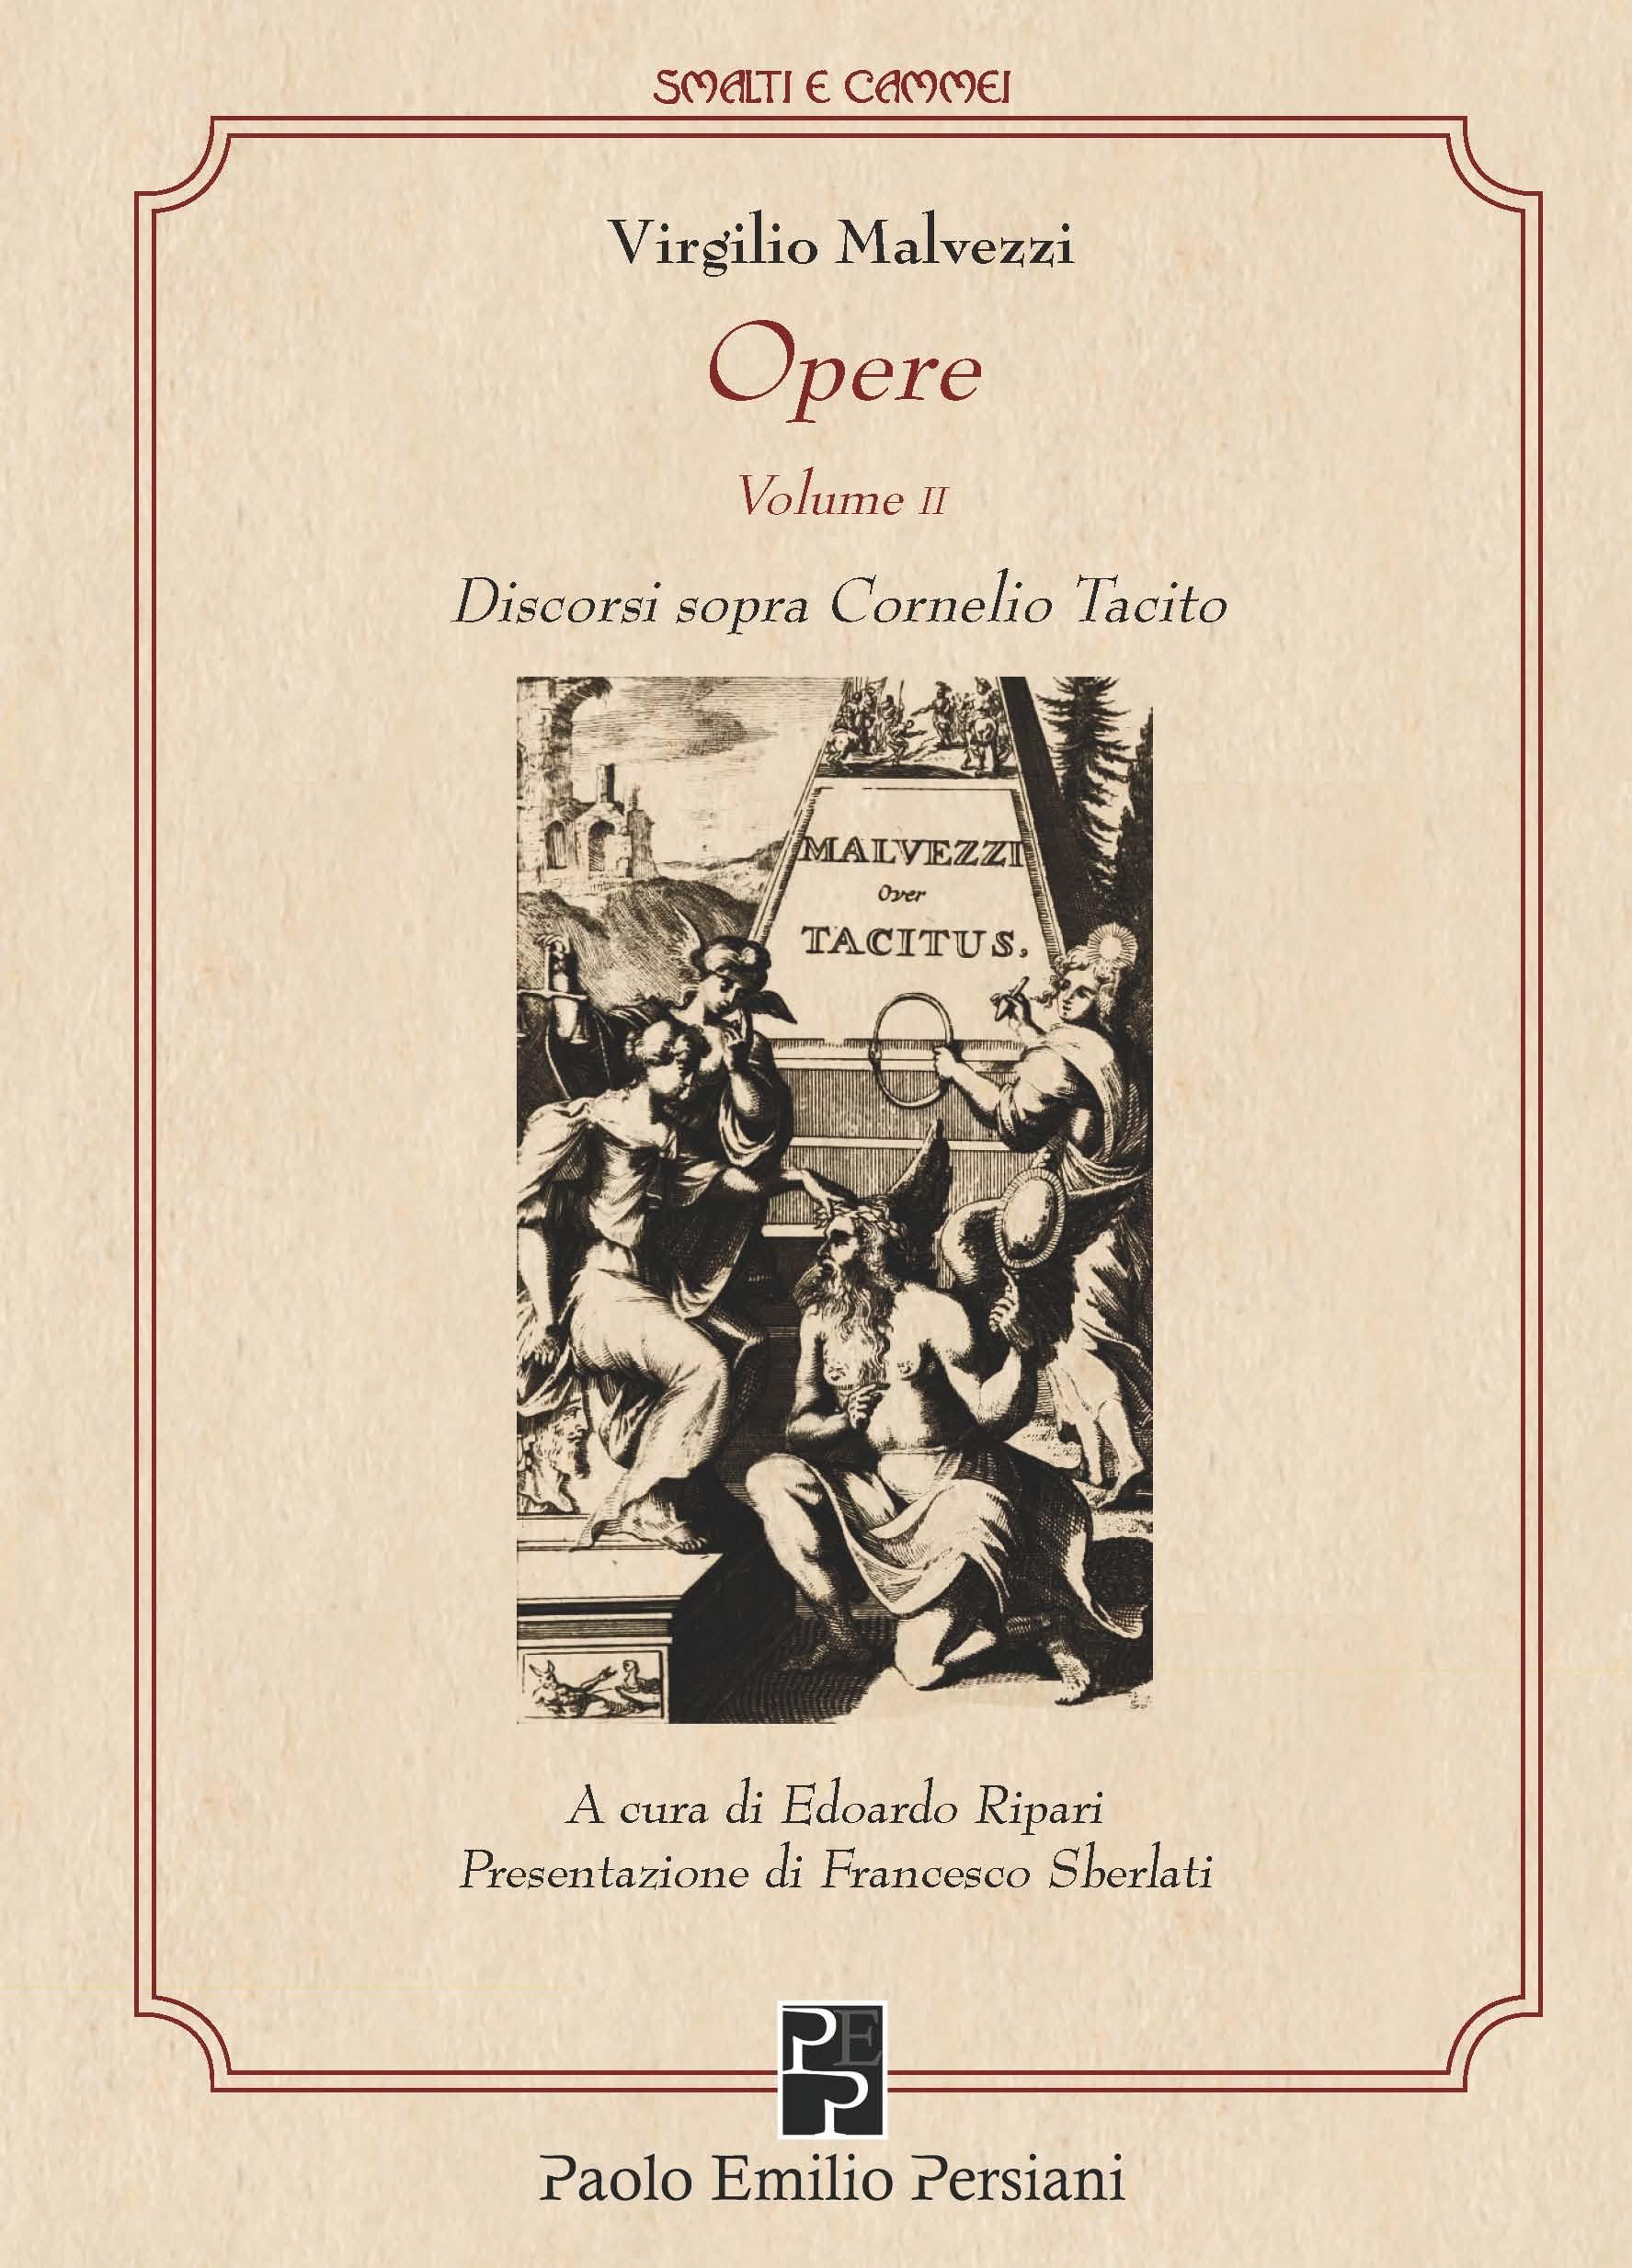 Malvezzi Opere 2